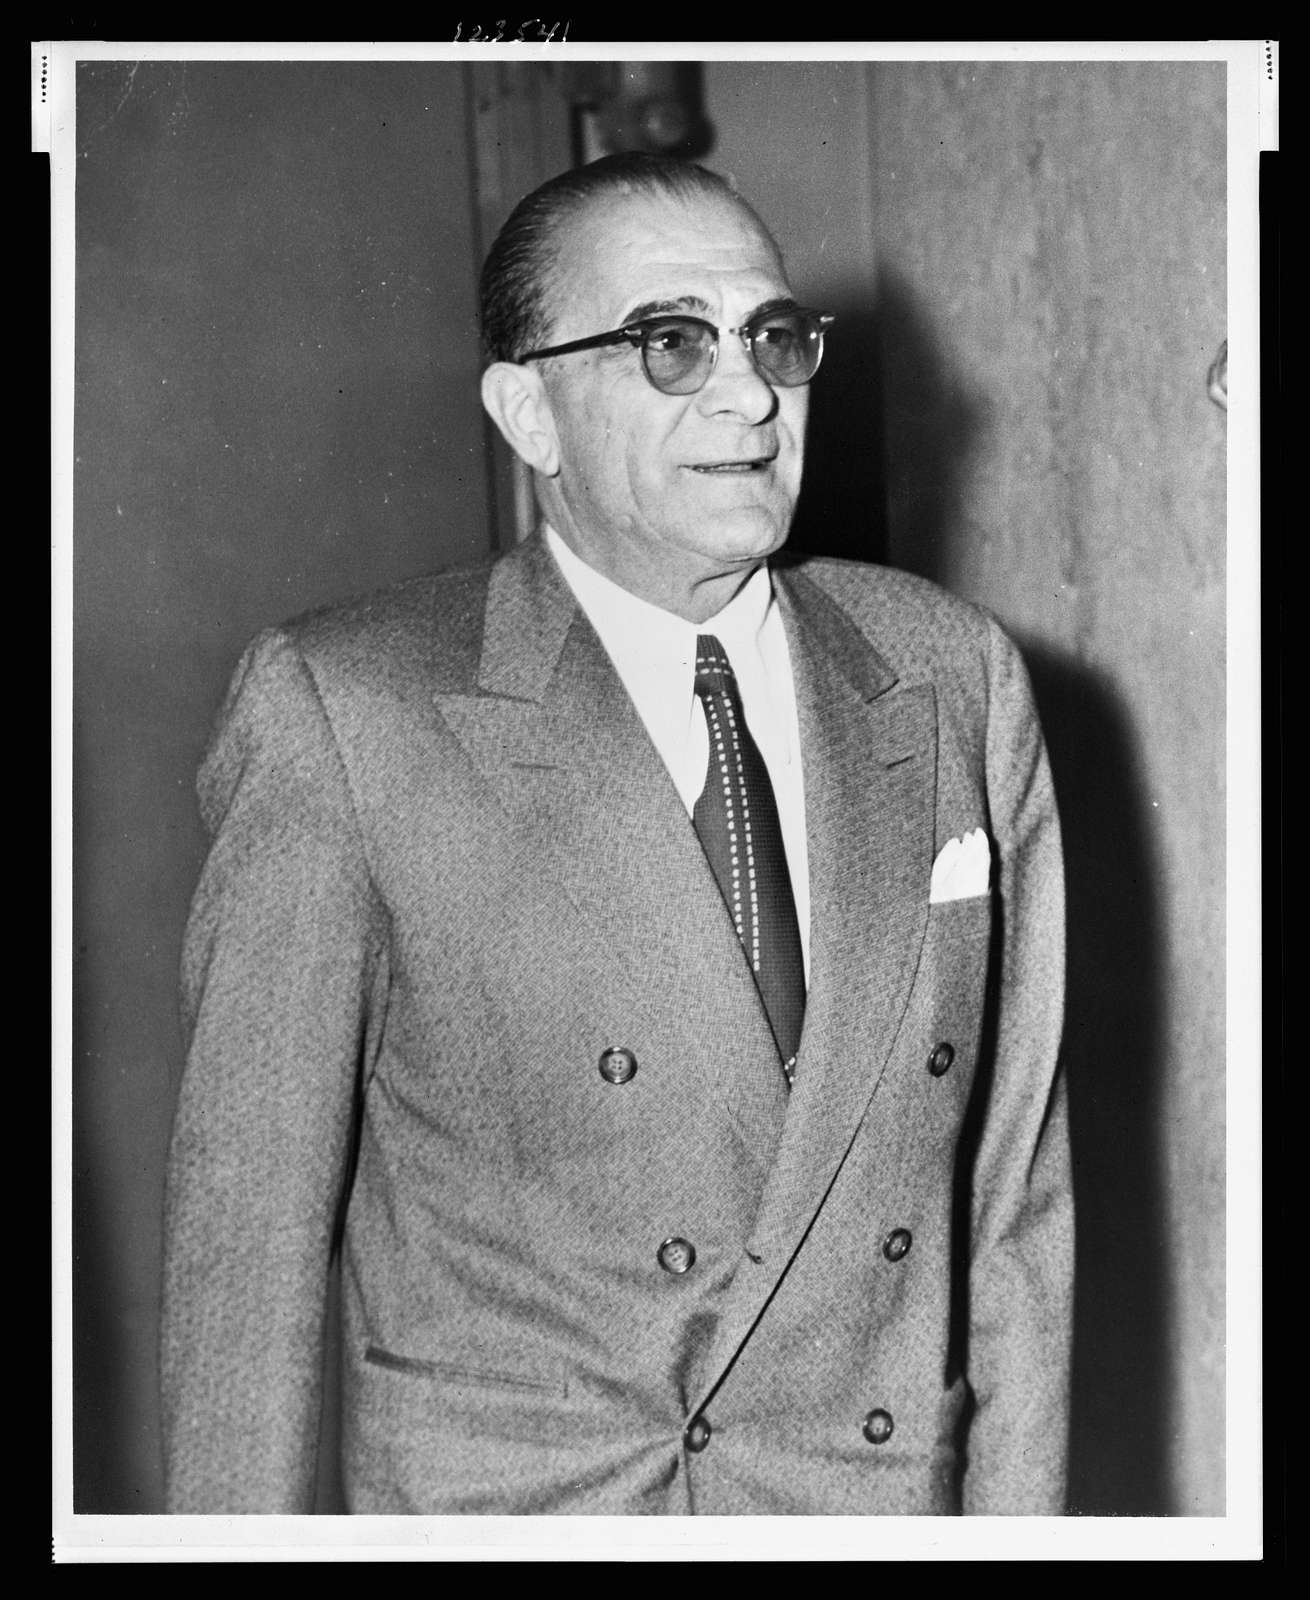 [Vito Genovese, half-length portrait, standing, facing right] / World Telegram & Sun photo by Phil Stanziola.